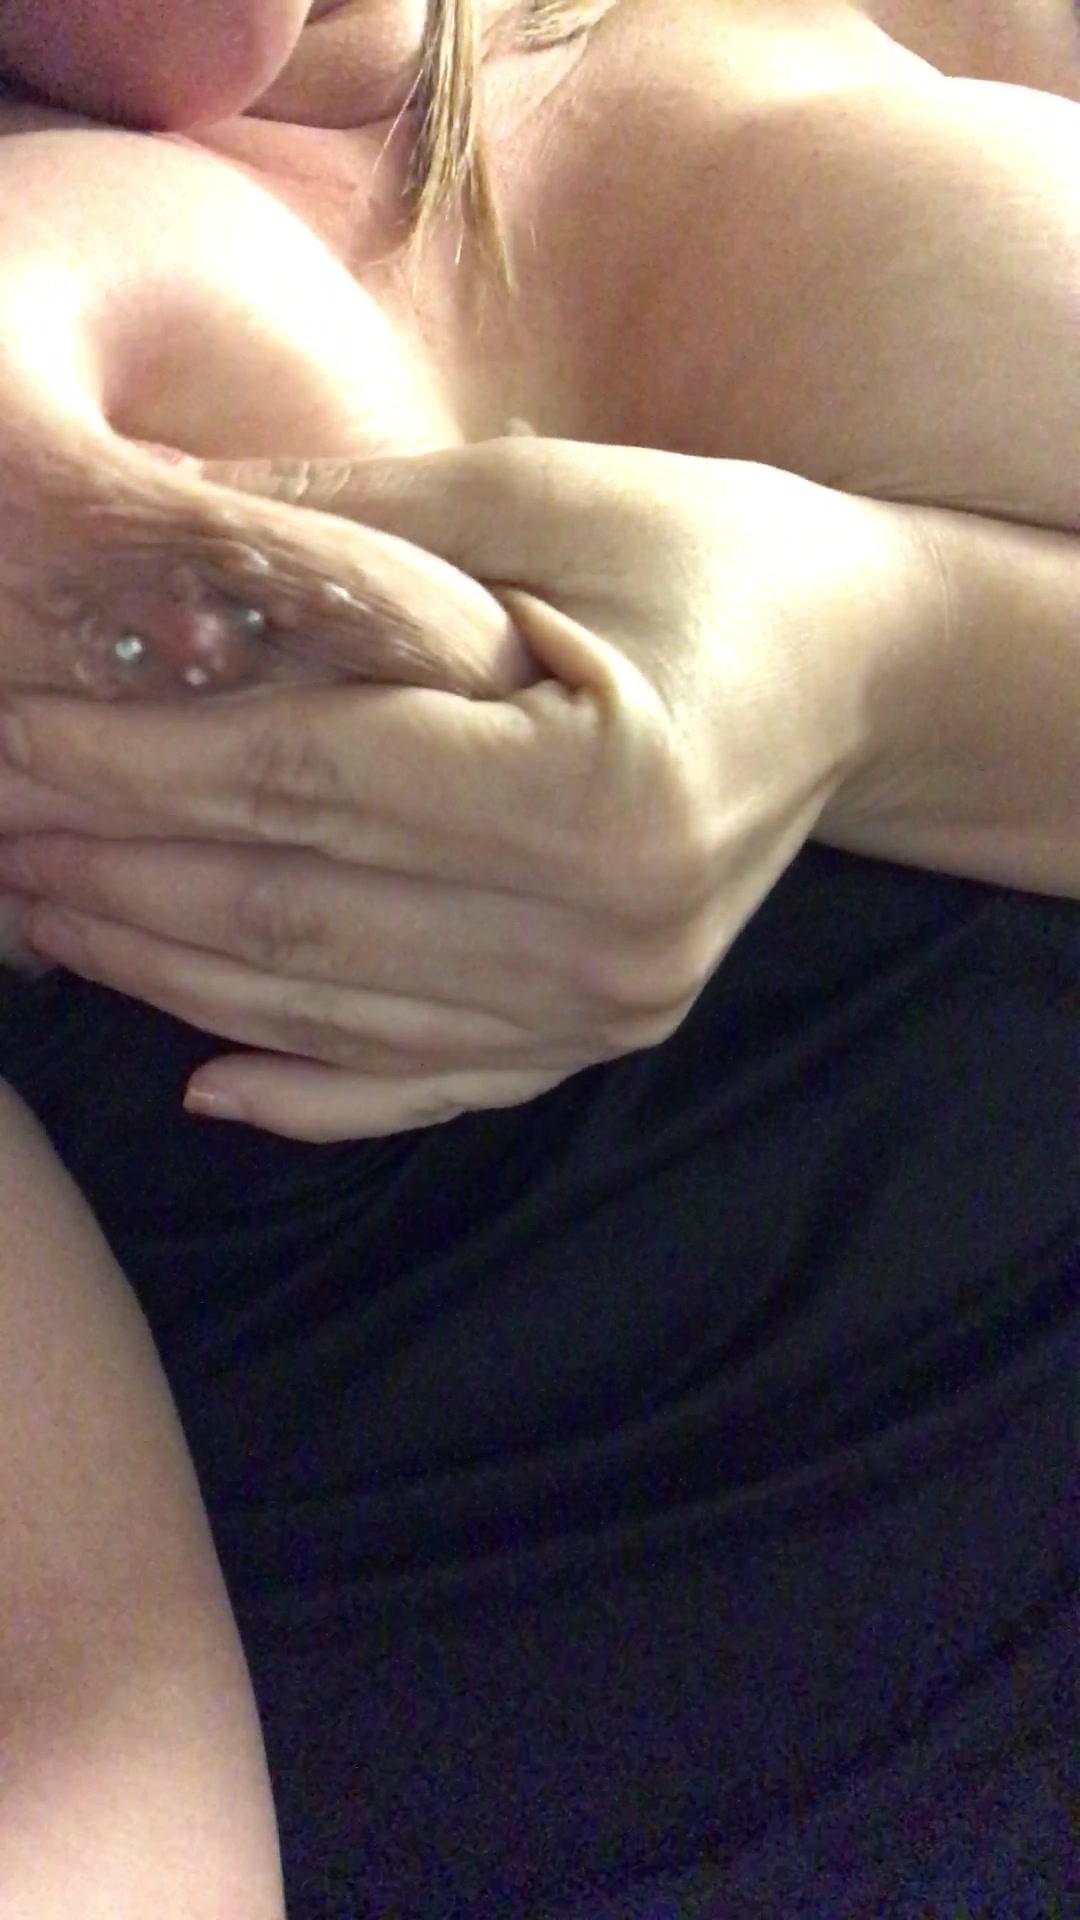 Silverman sexy big lactating tits videos woman eating ass